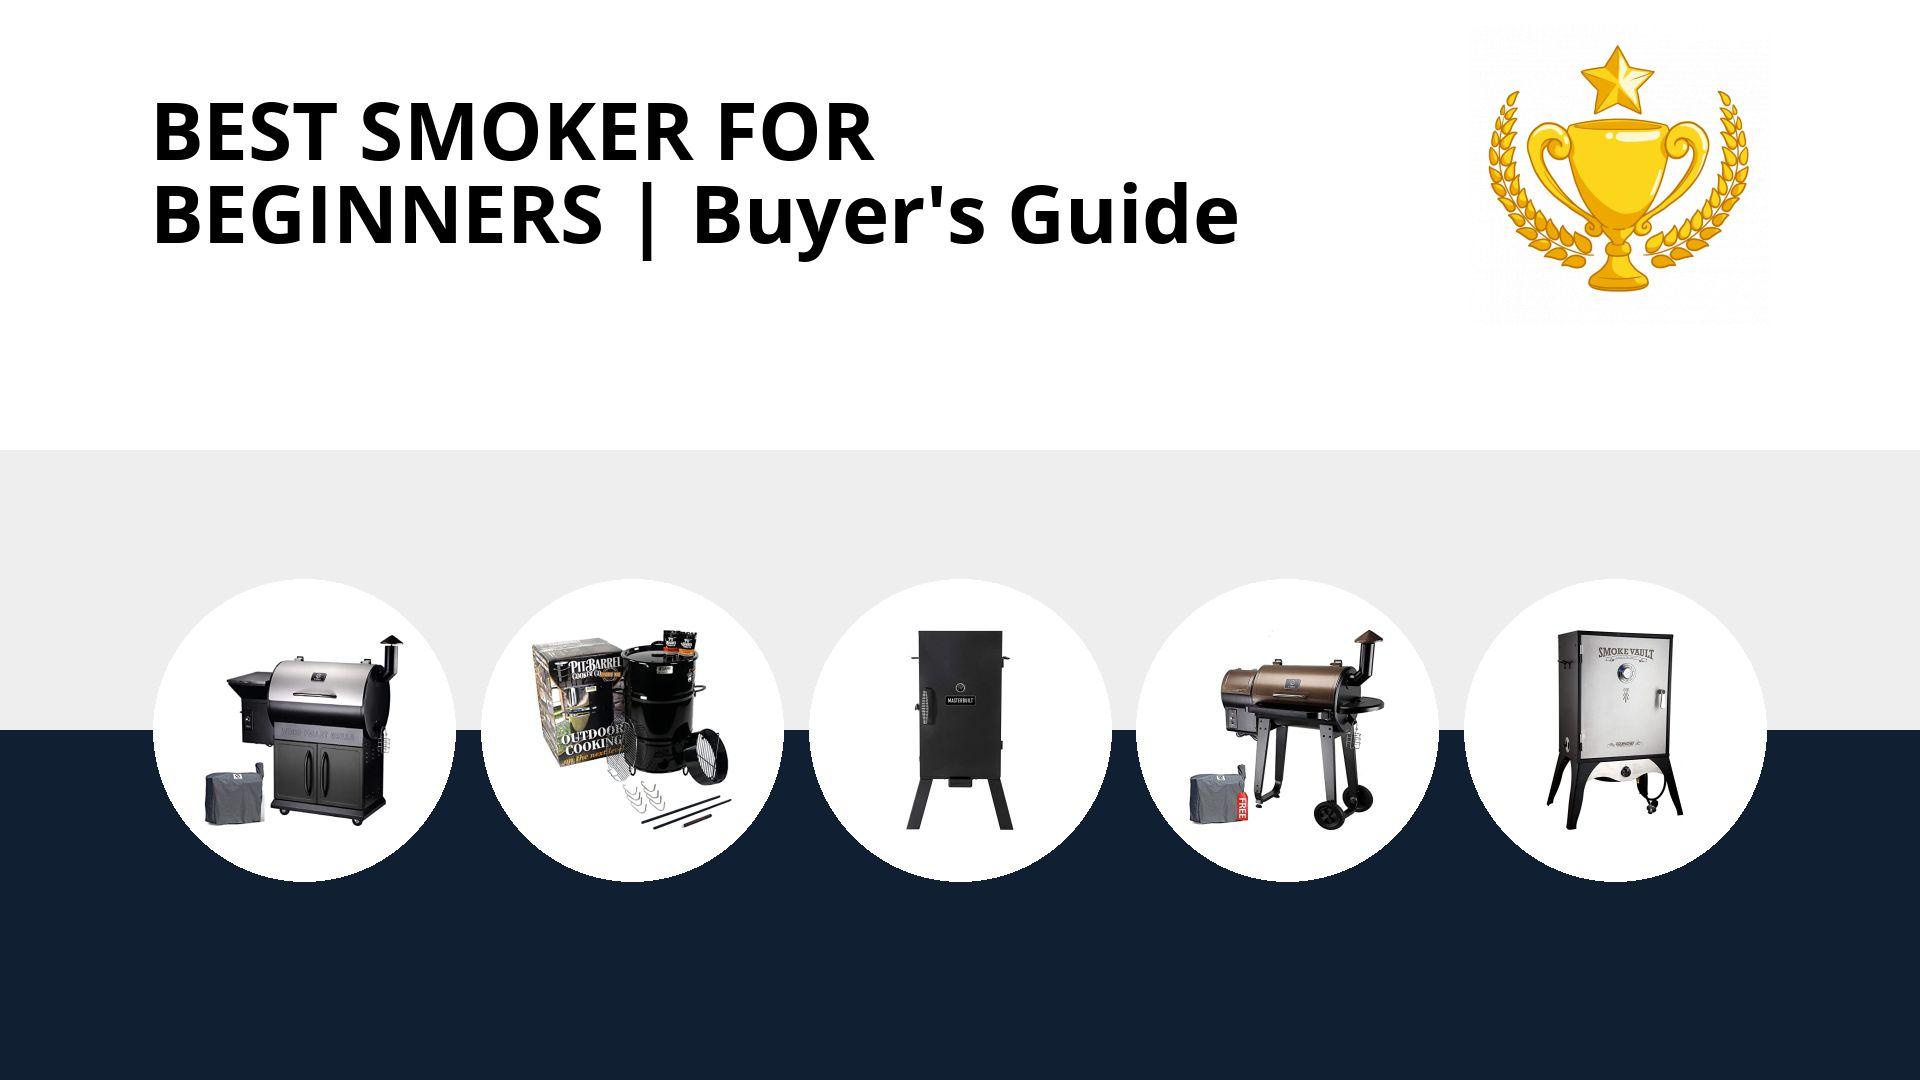 Best Smoker For Beginners: image